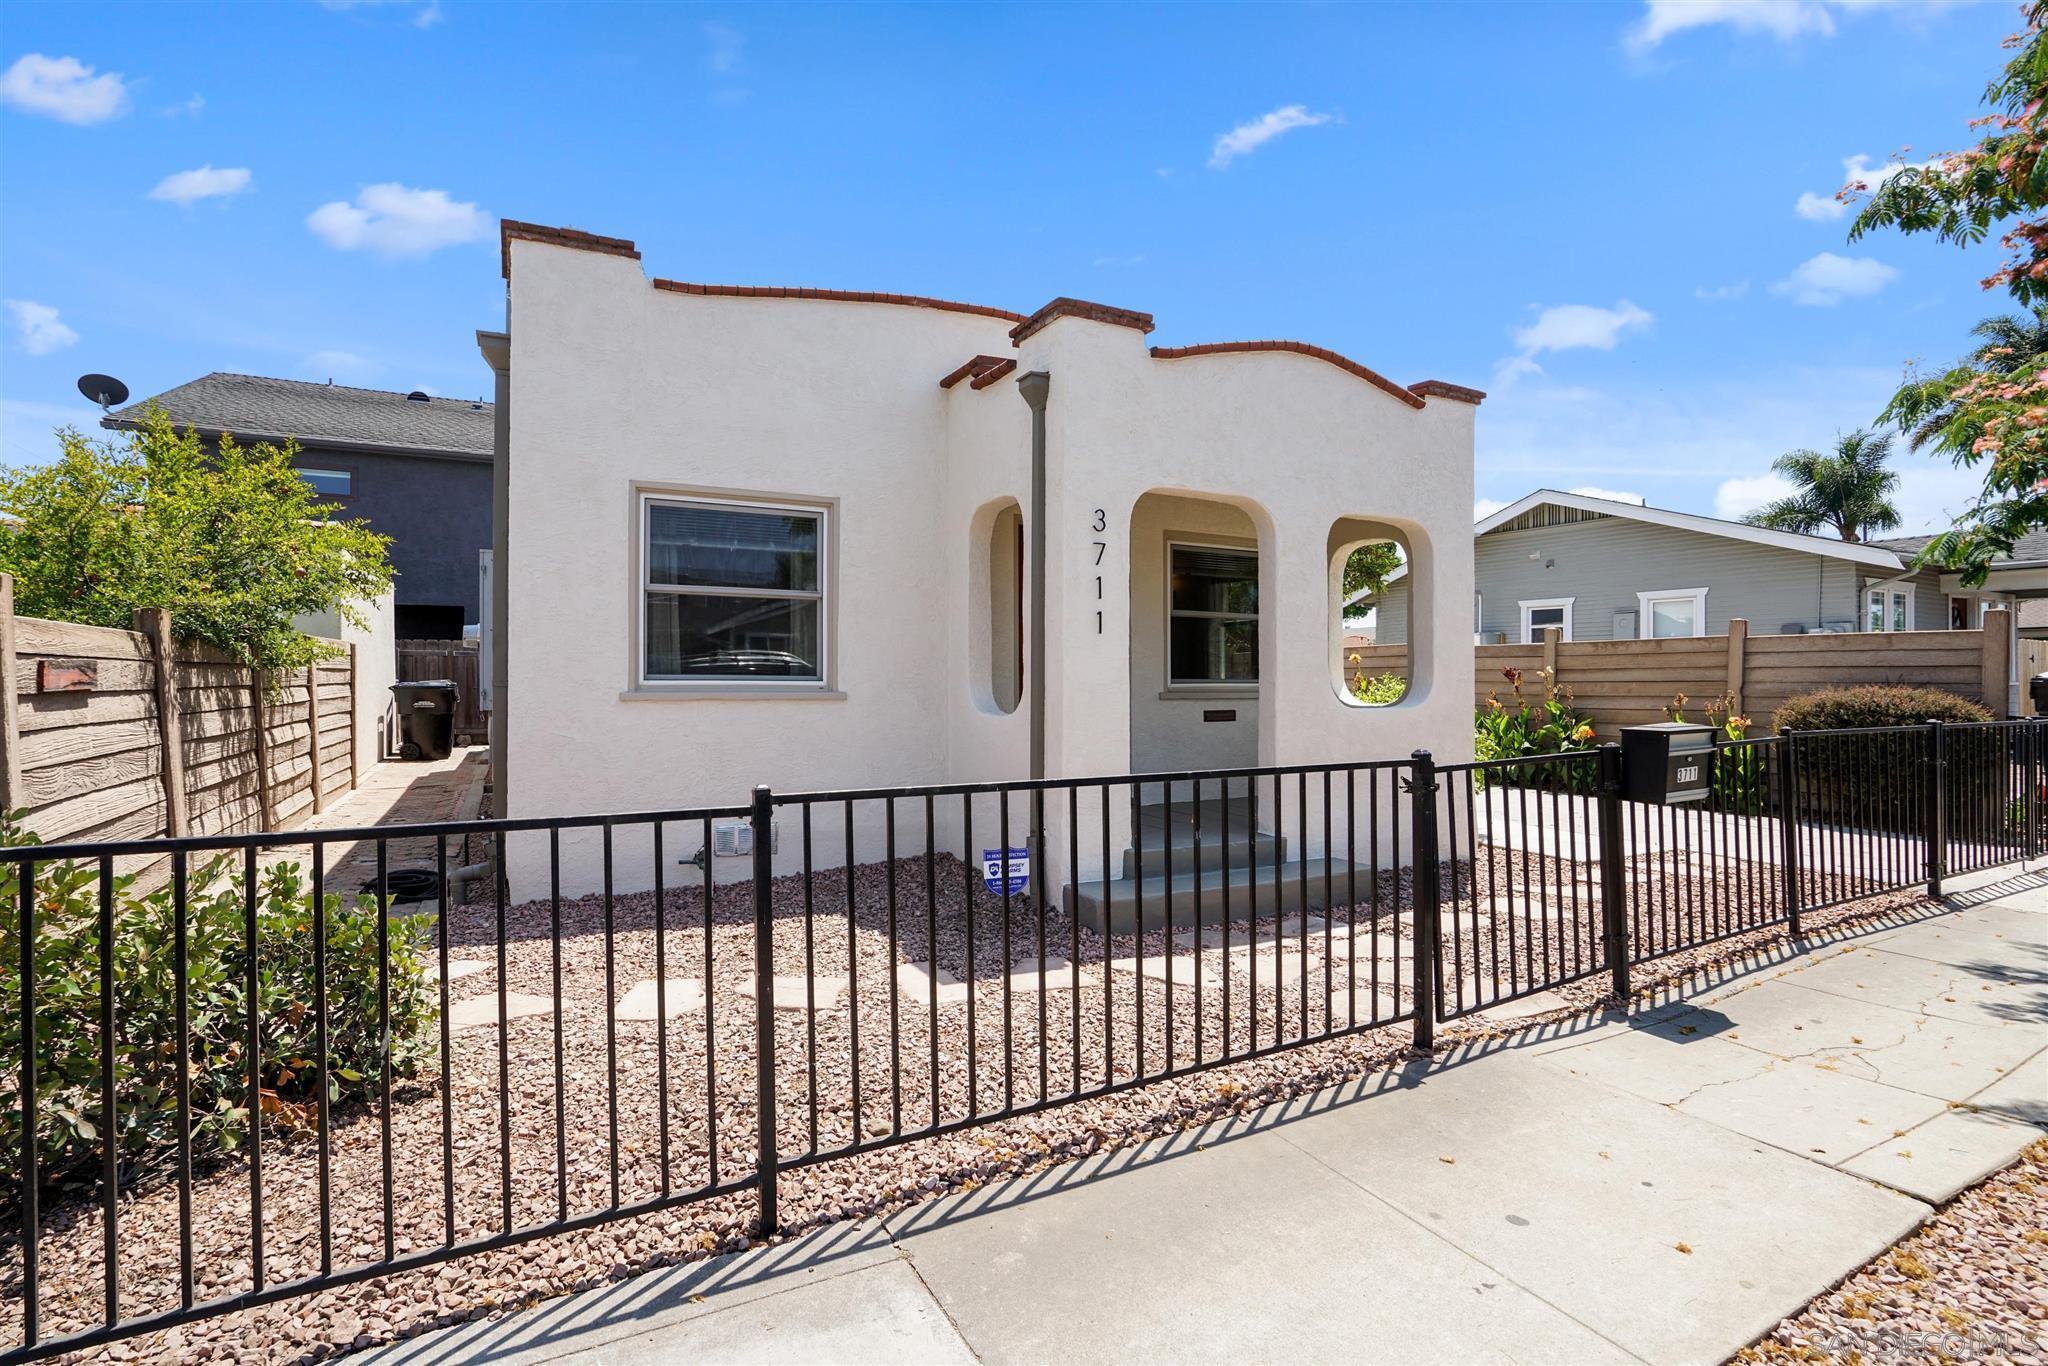 3711 Meade Ave, San Diego, CA 92116